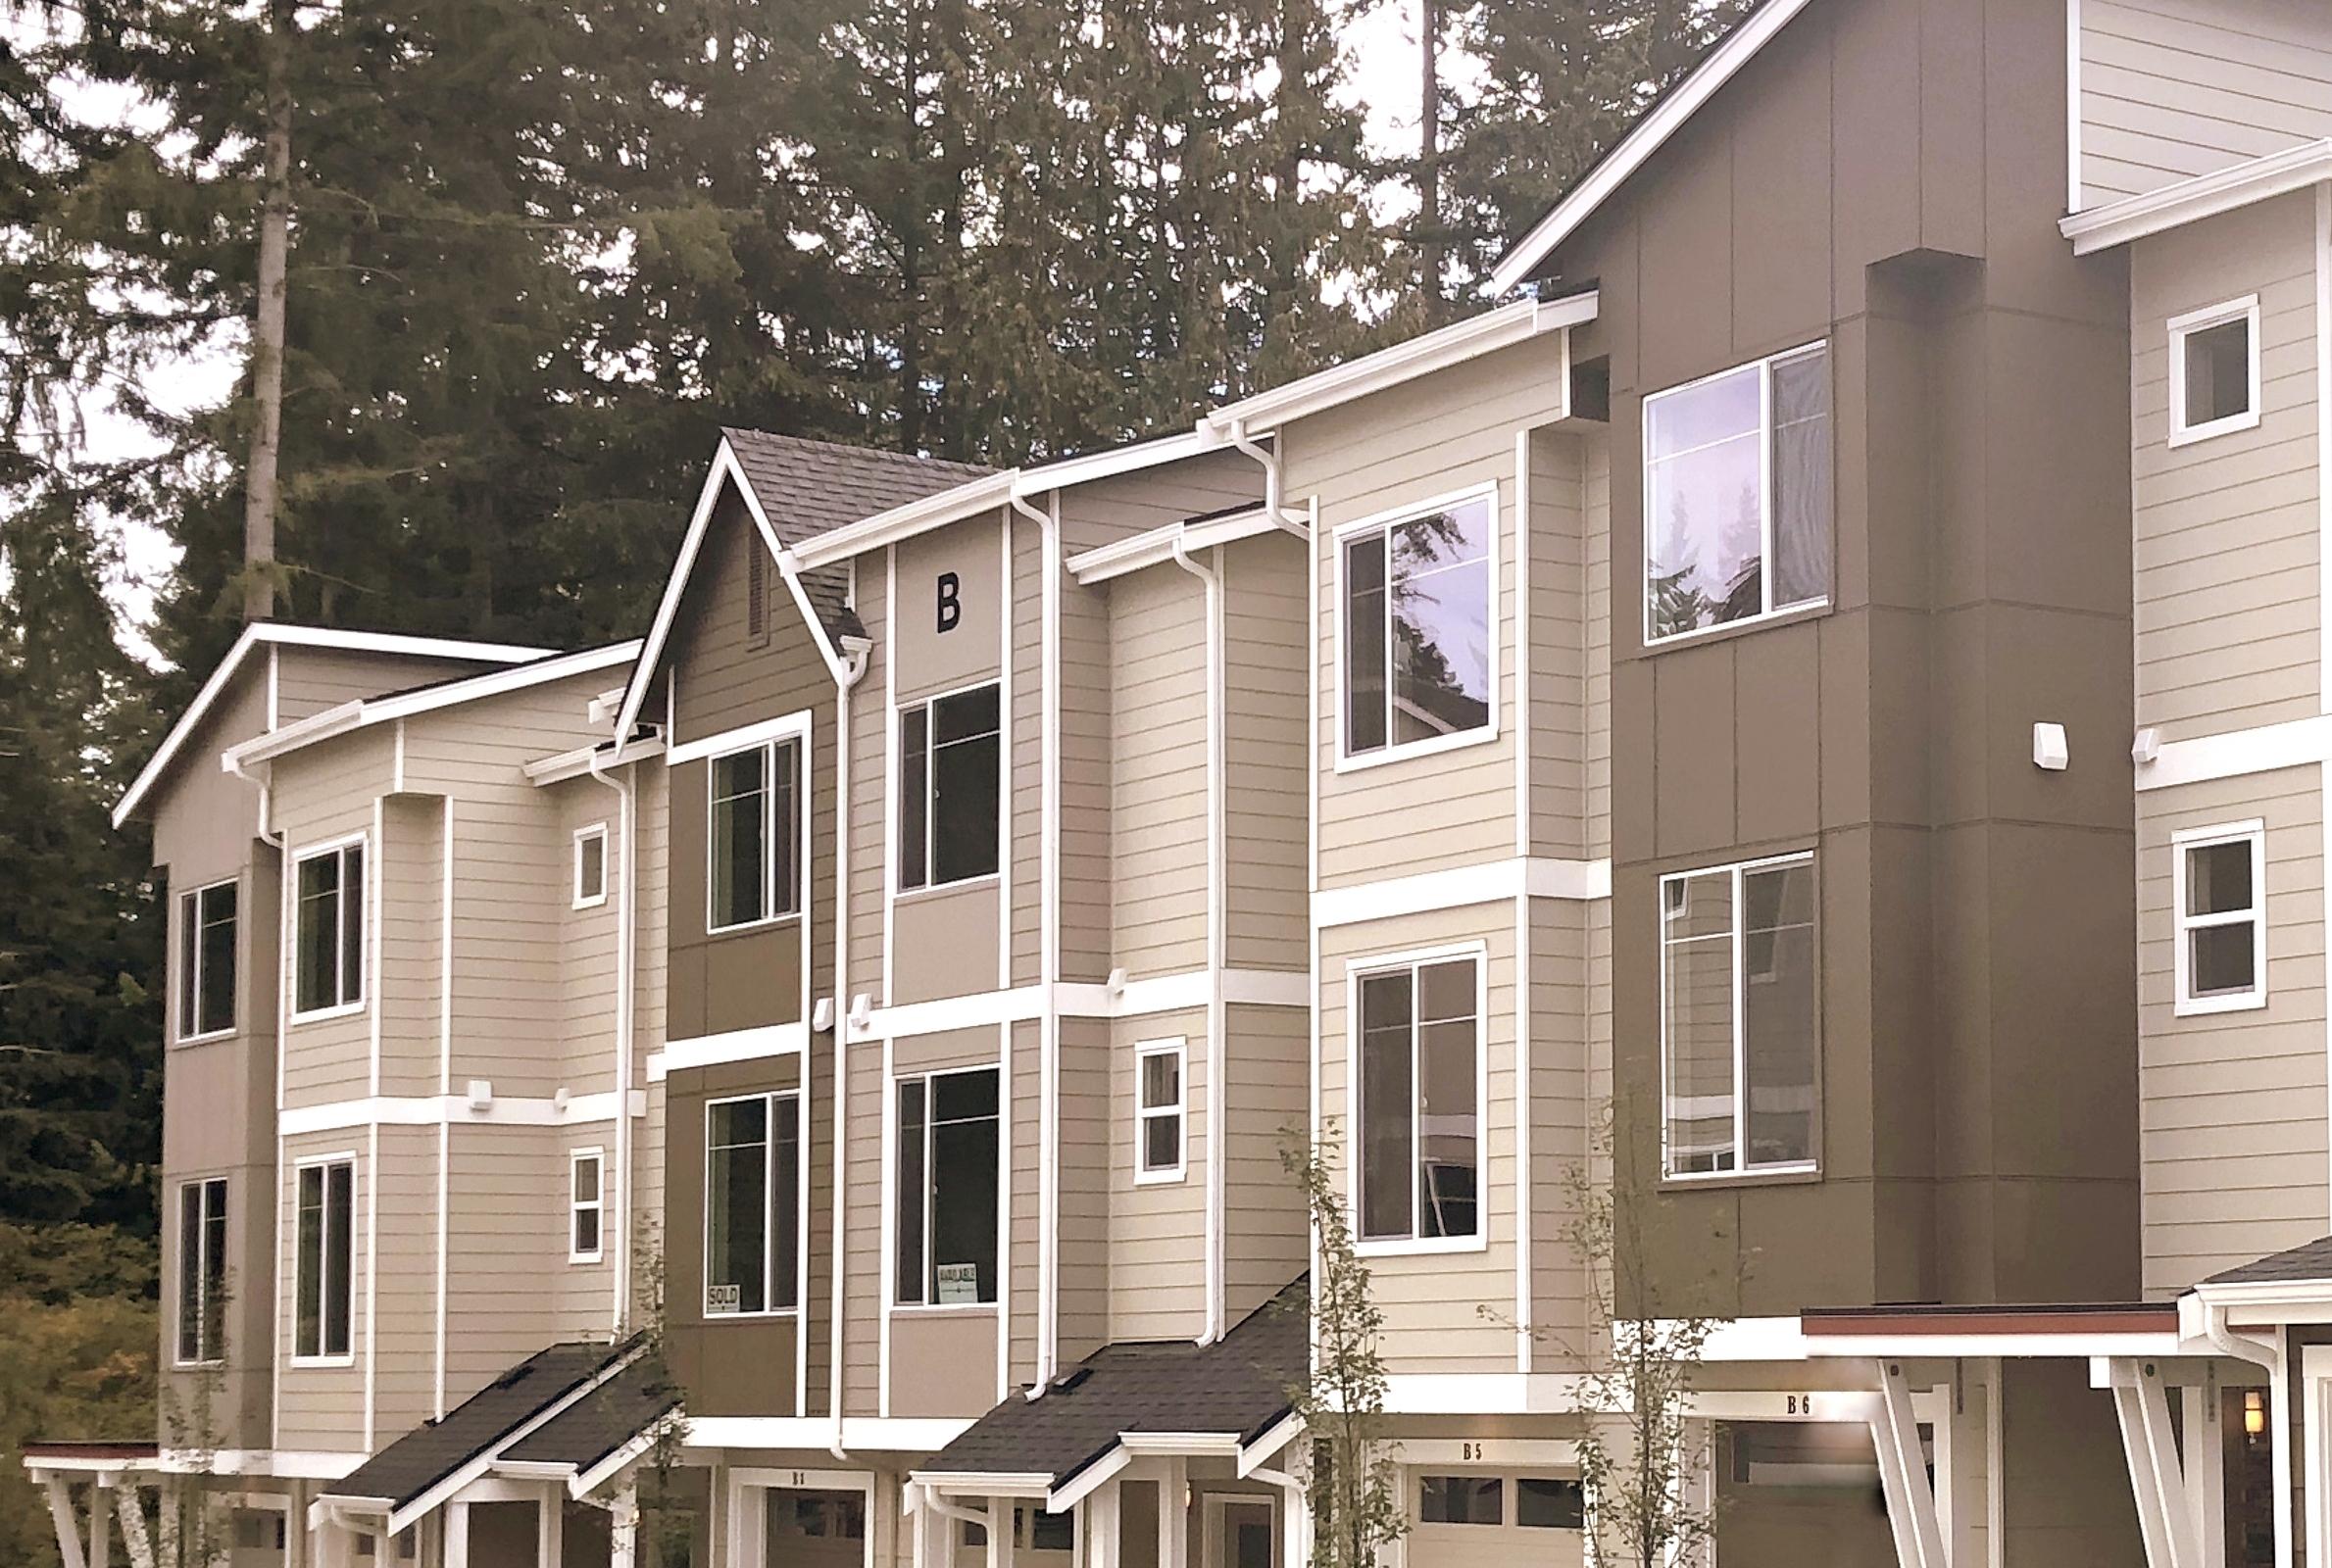 B Building - Front Street View - Facing East - Copy.JPG